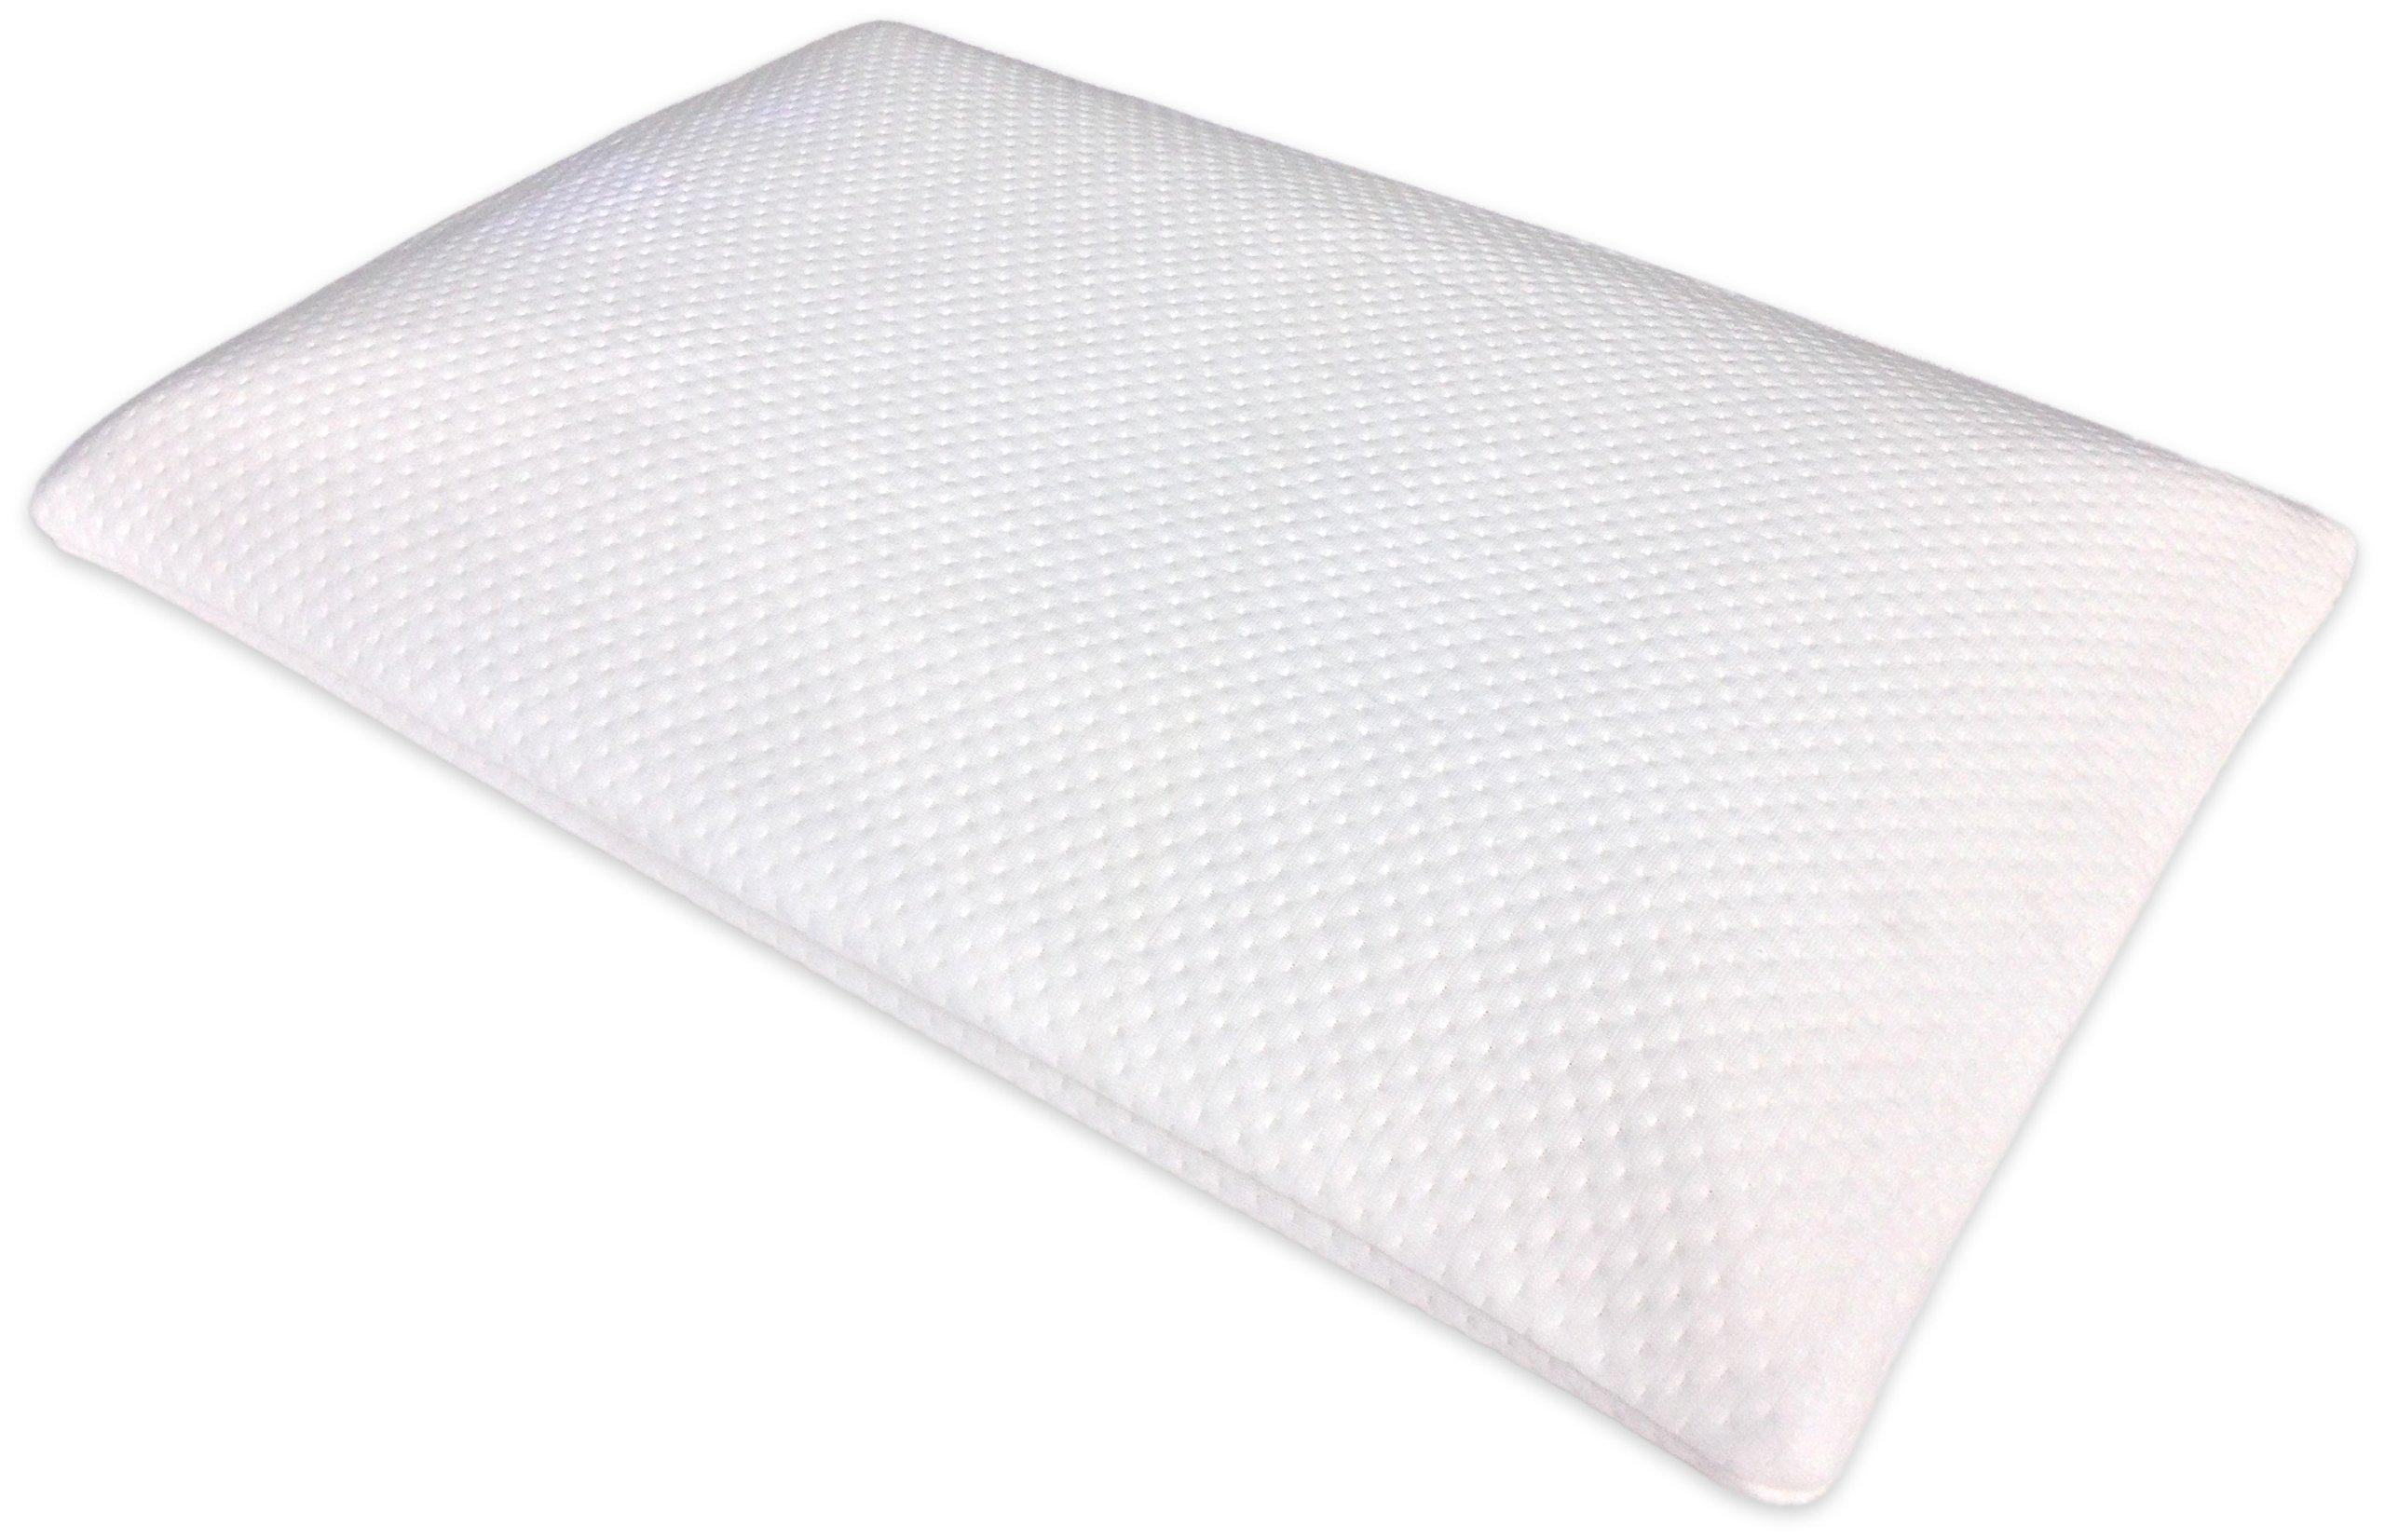 Home Luxury Living 2 5 Inch Ultra Thin Memory Foam Pillow